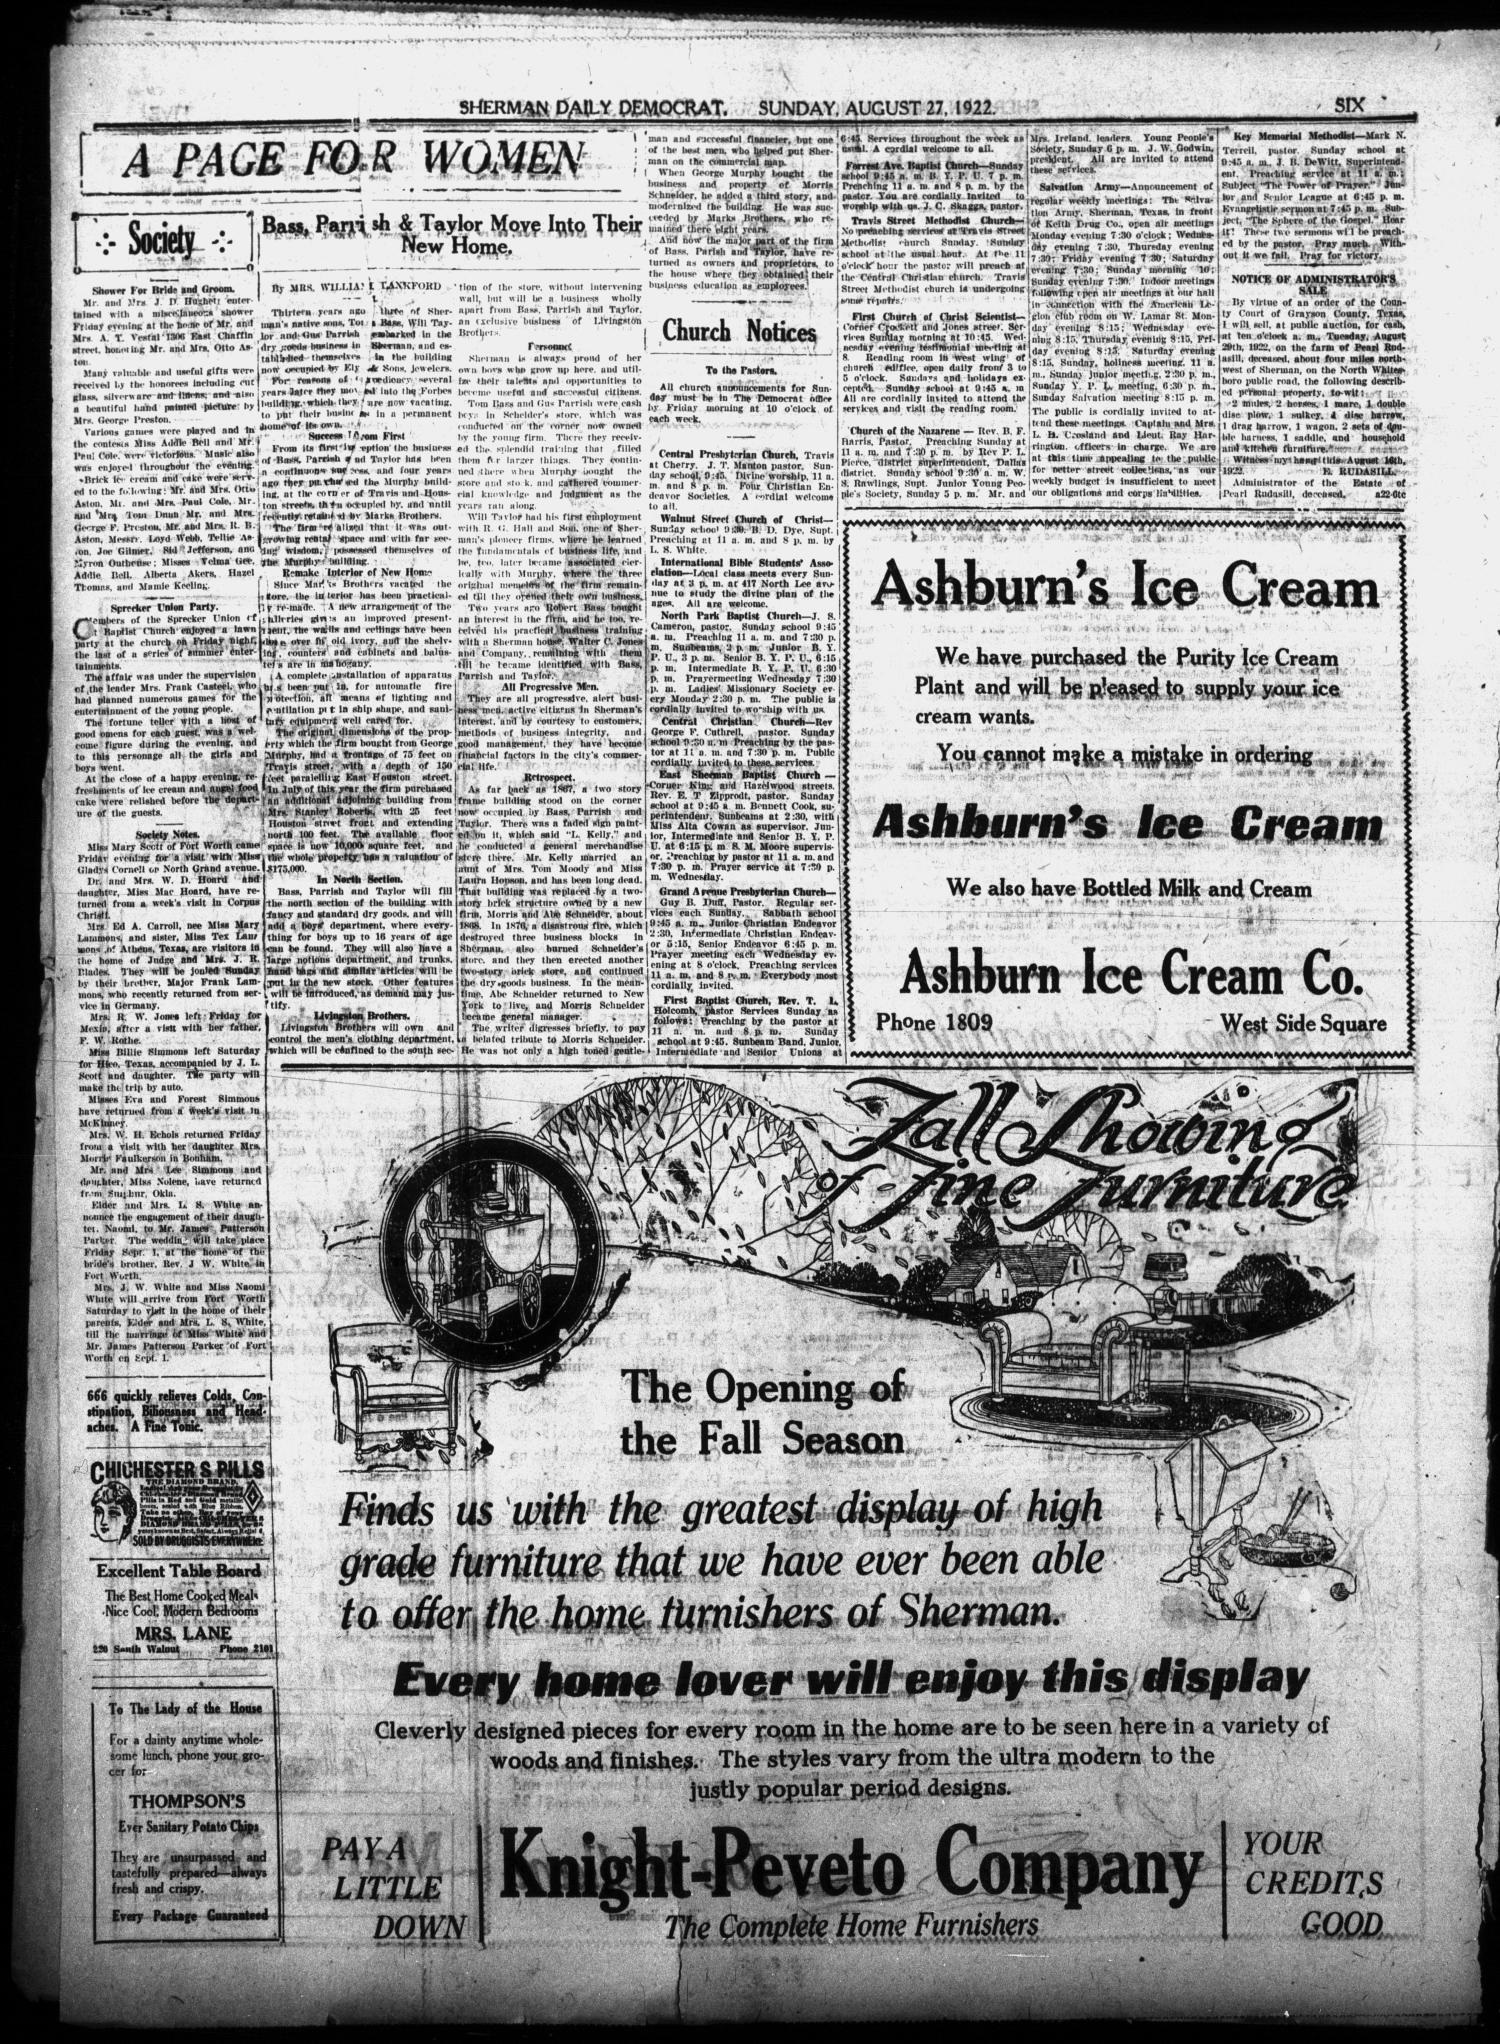 Article written on the Schneider Building in 1922